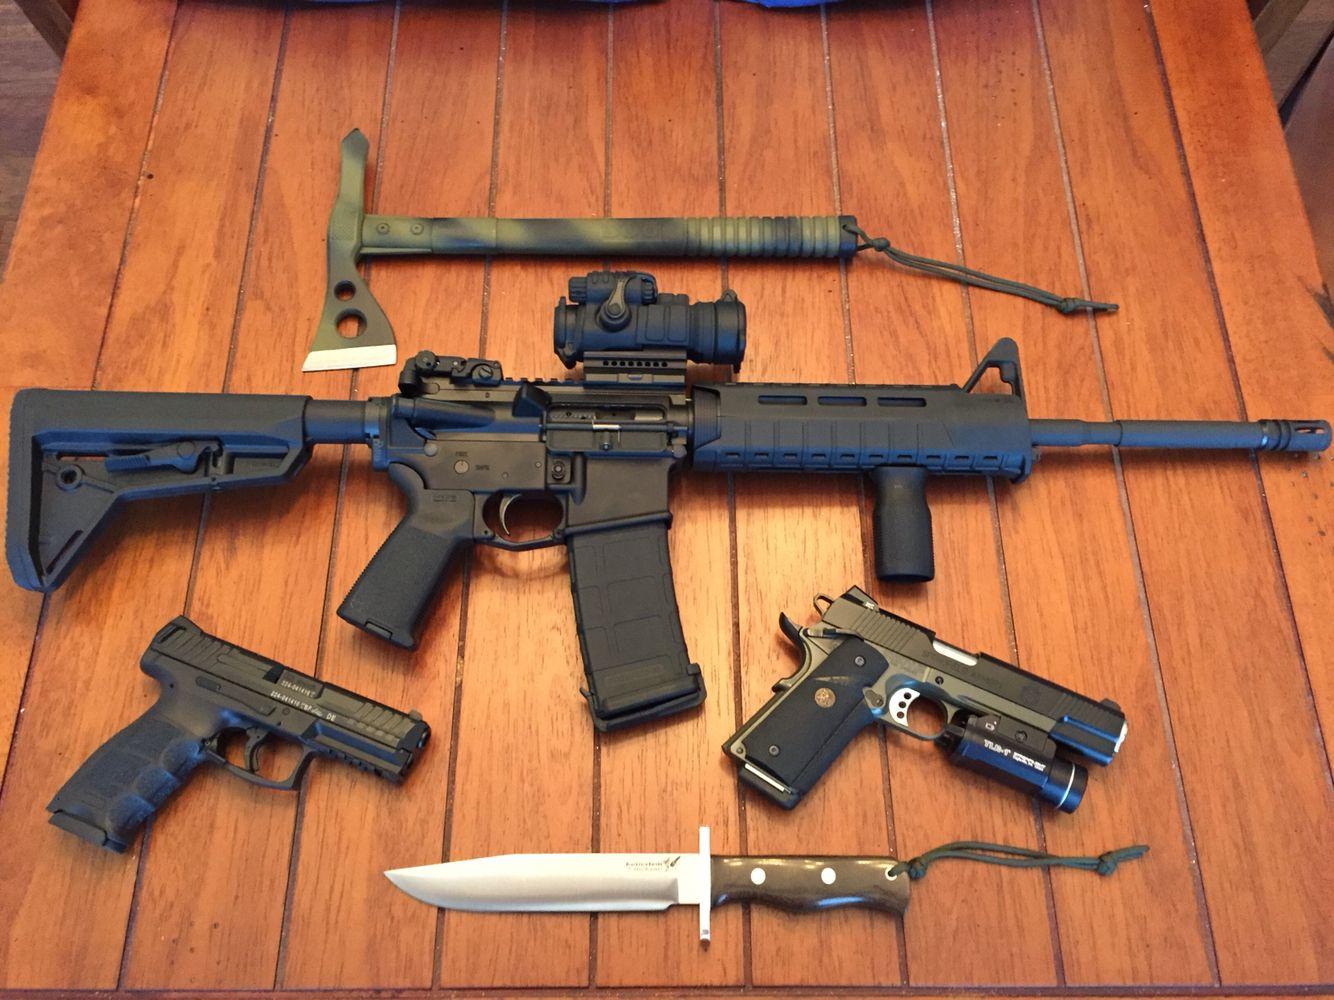 My Daniel Defense With Magpul MOE SL Furniture. HK VP9, Springfield MC  Operator. Blackjack Model 14 Border Patrol, SOG Hawk.